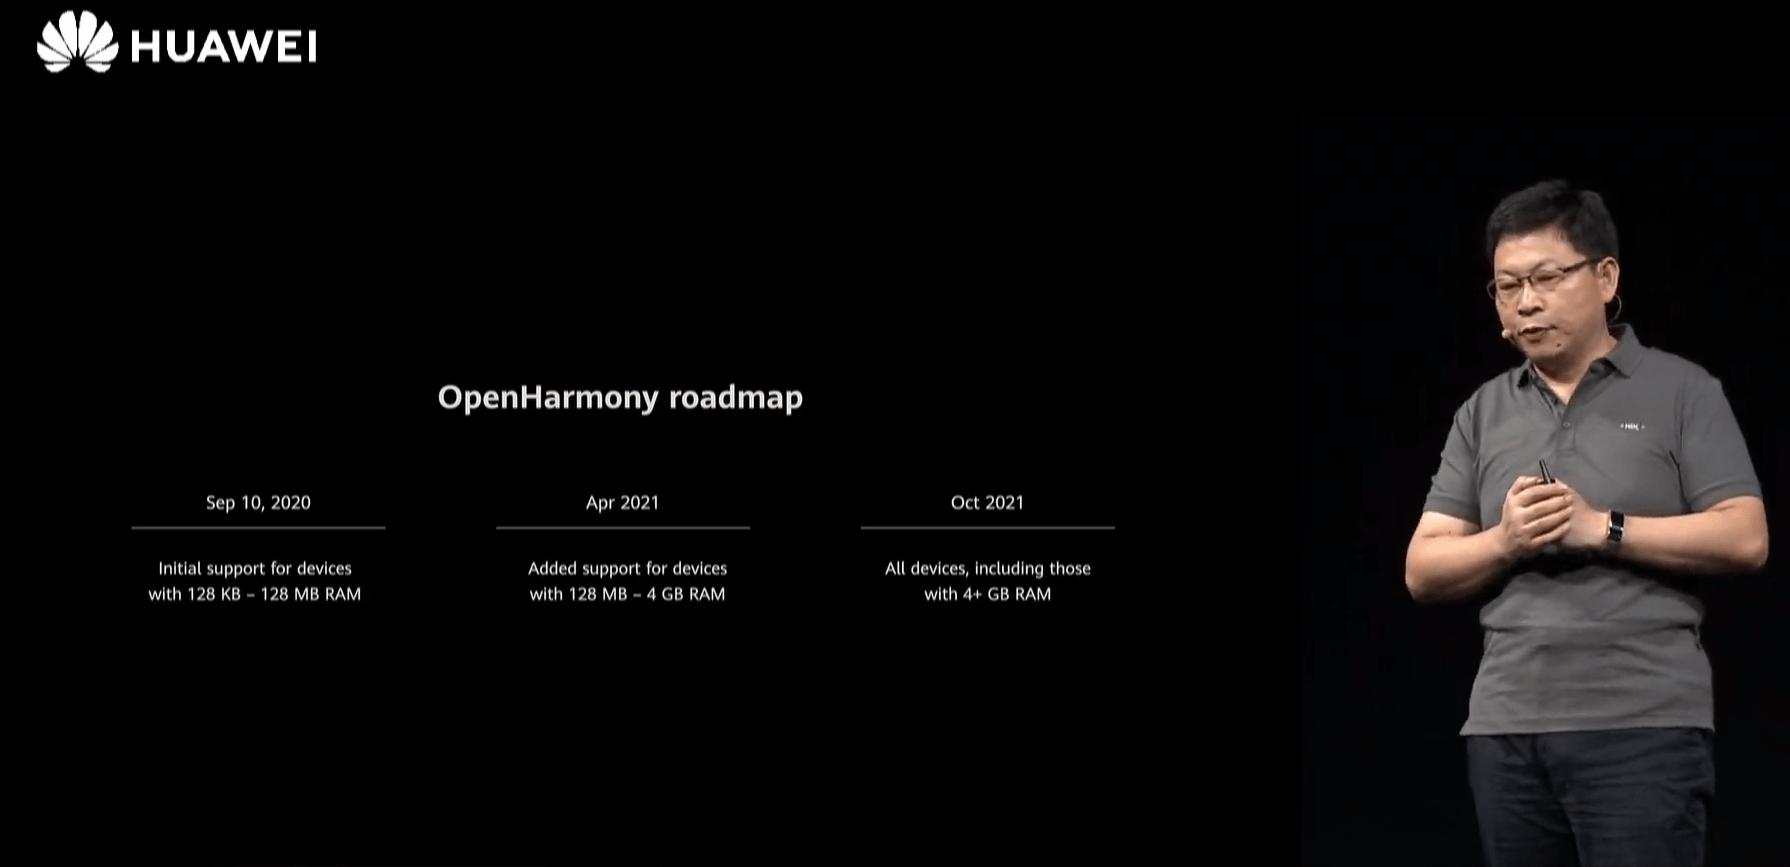 huawei harmonyos smartphones 2021 roadmap